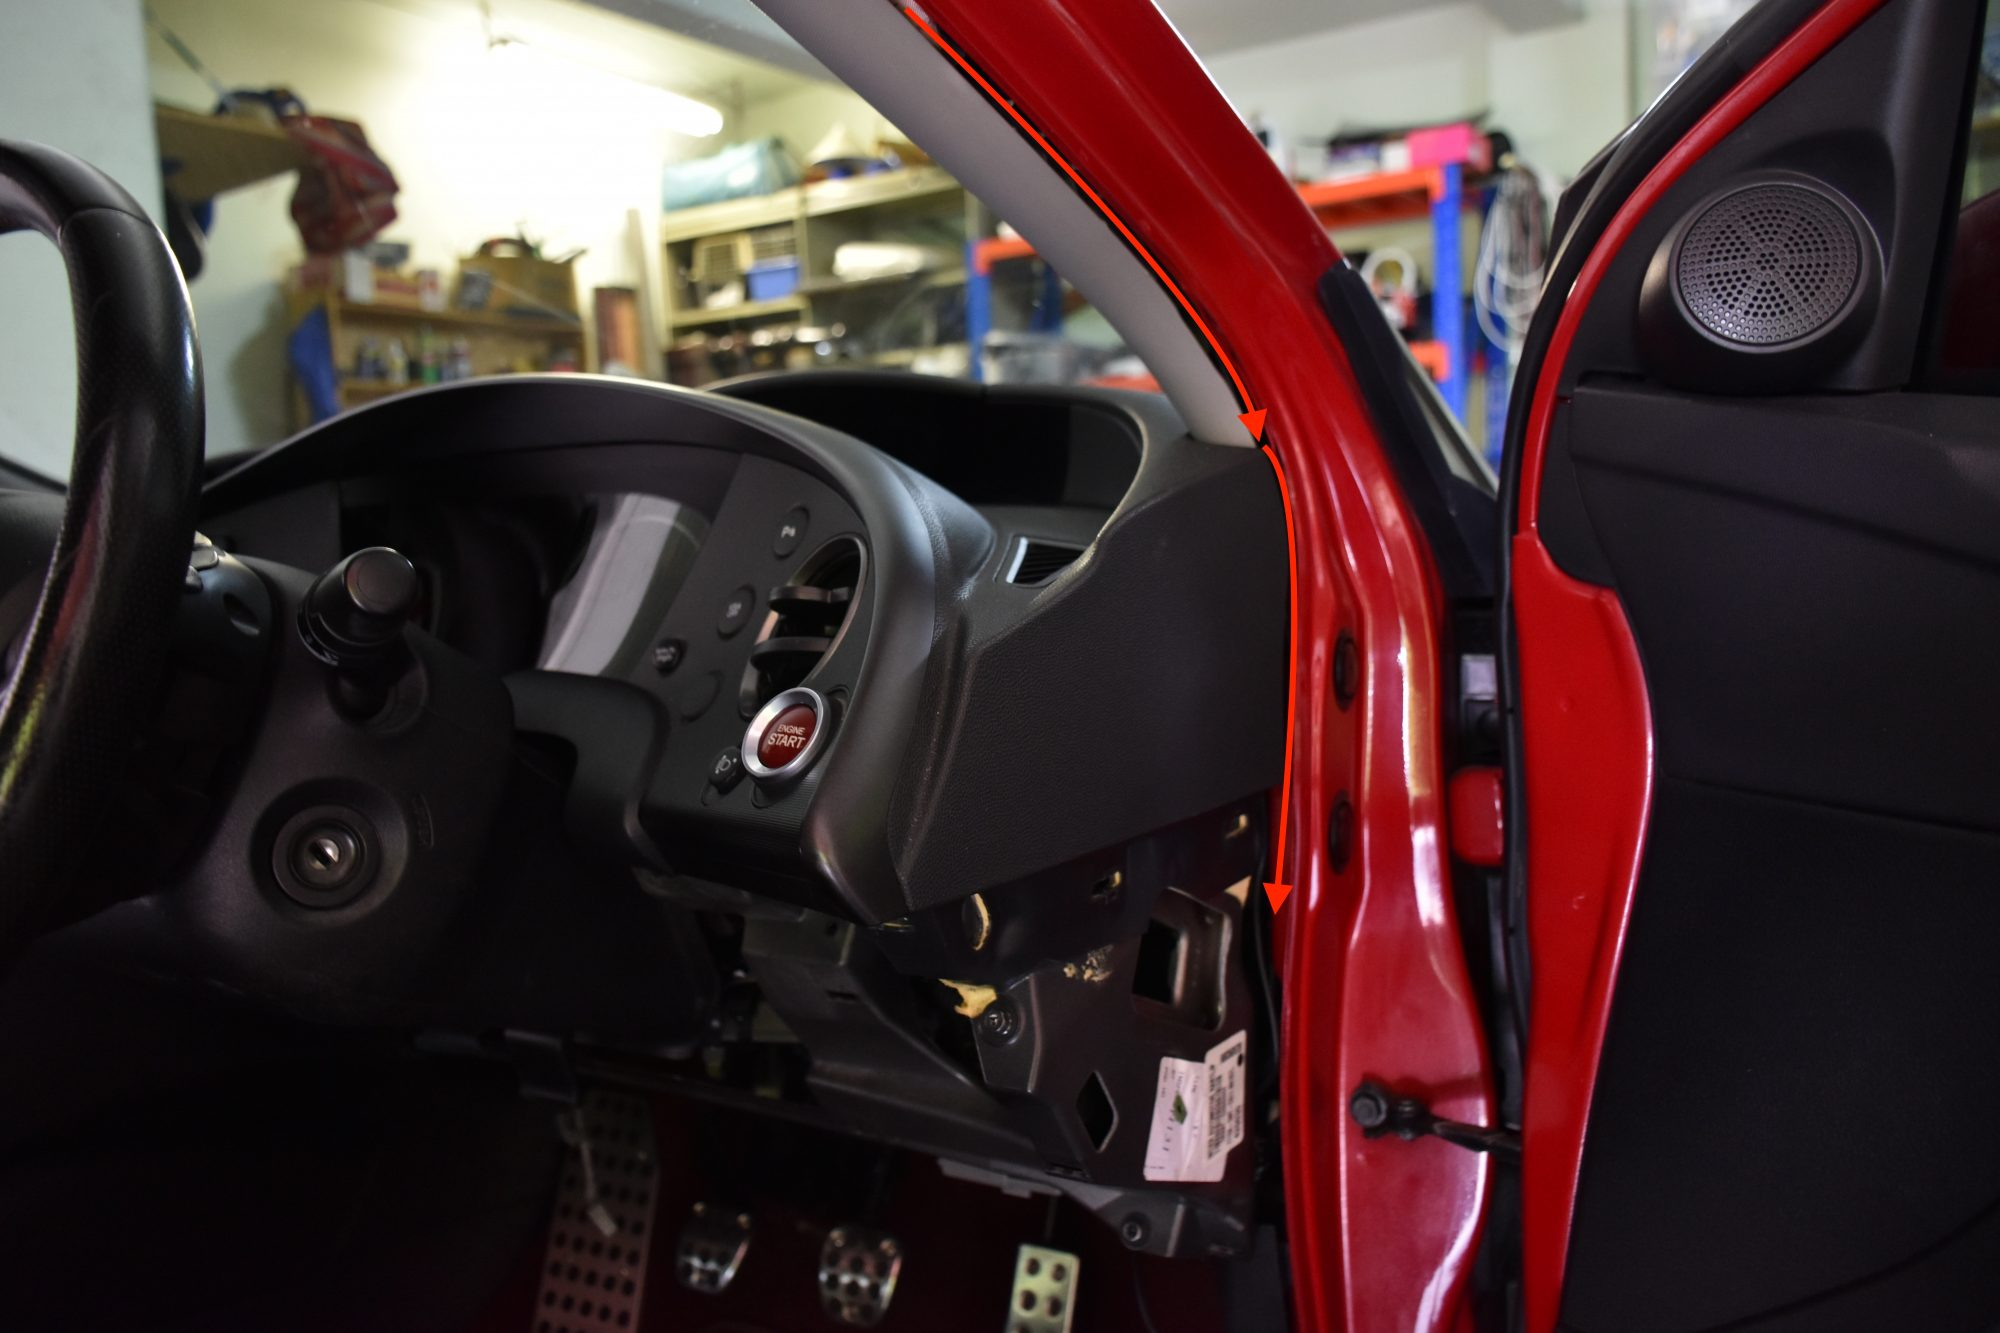 FN Civic Dash Cam Install Tutorial